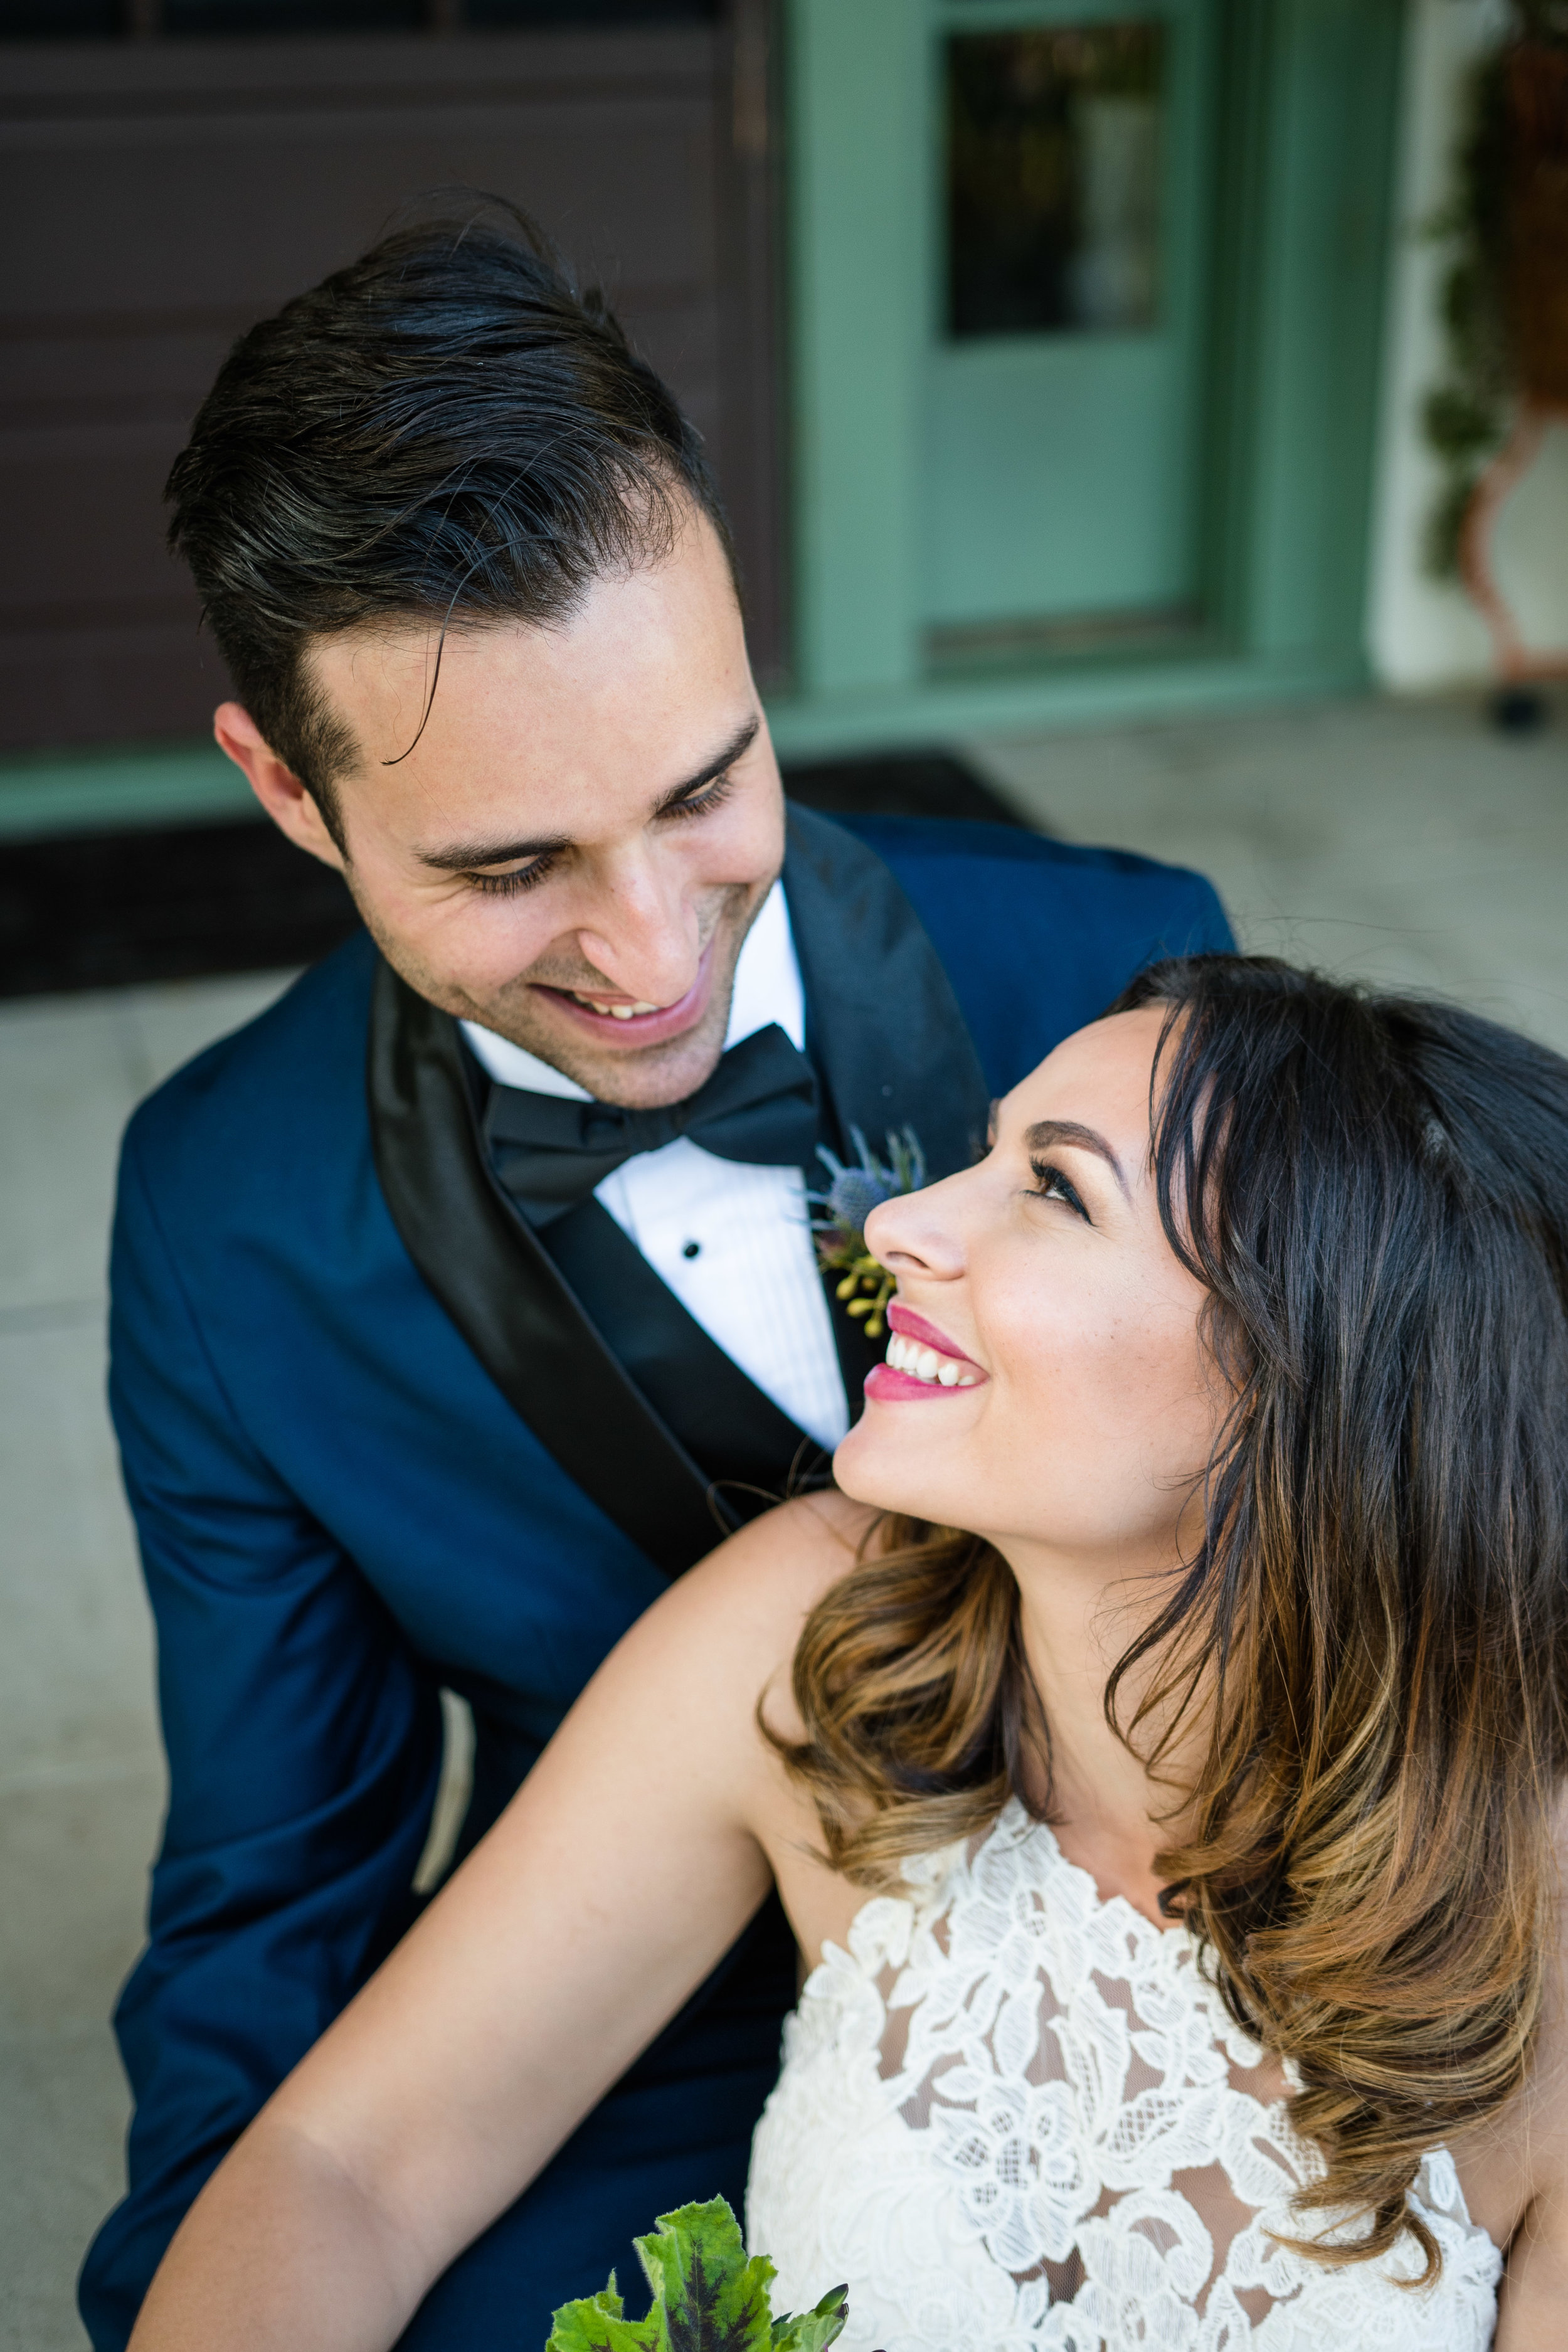 Vibrant Fiesta Backyard Wedding Reception bride looks lovingly at her new groom.jpg